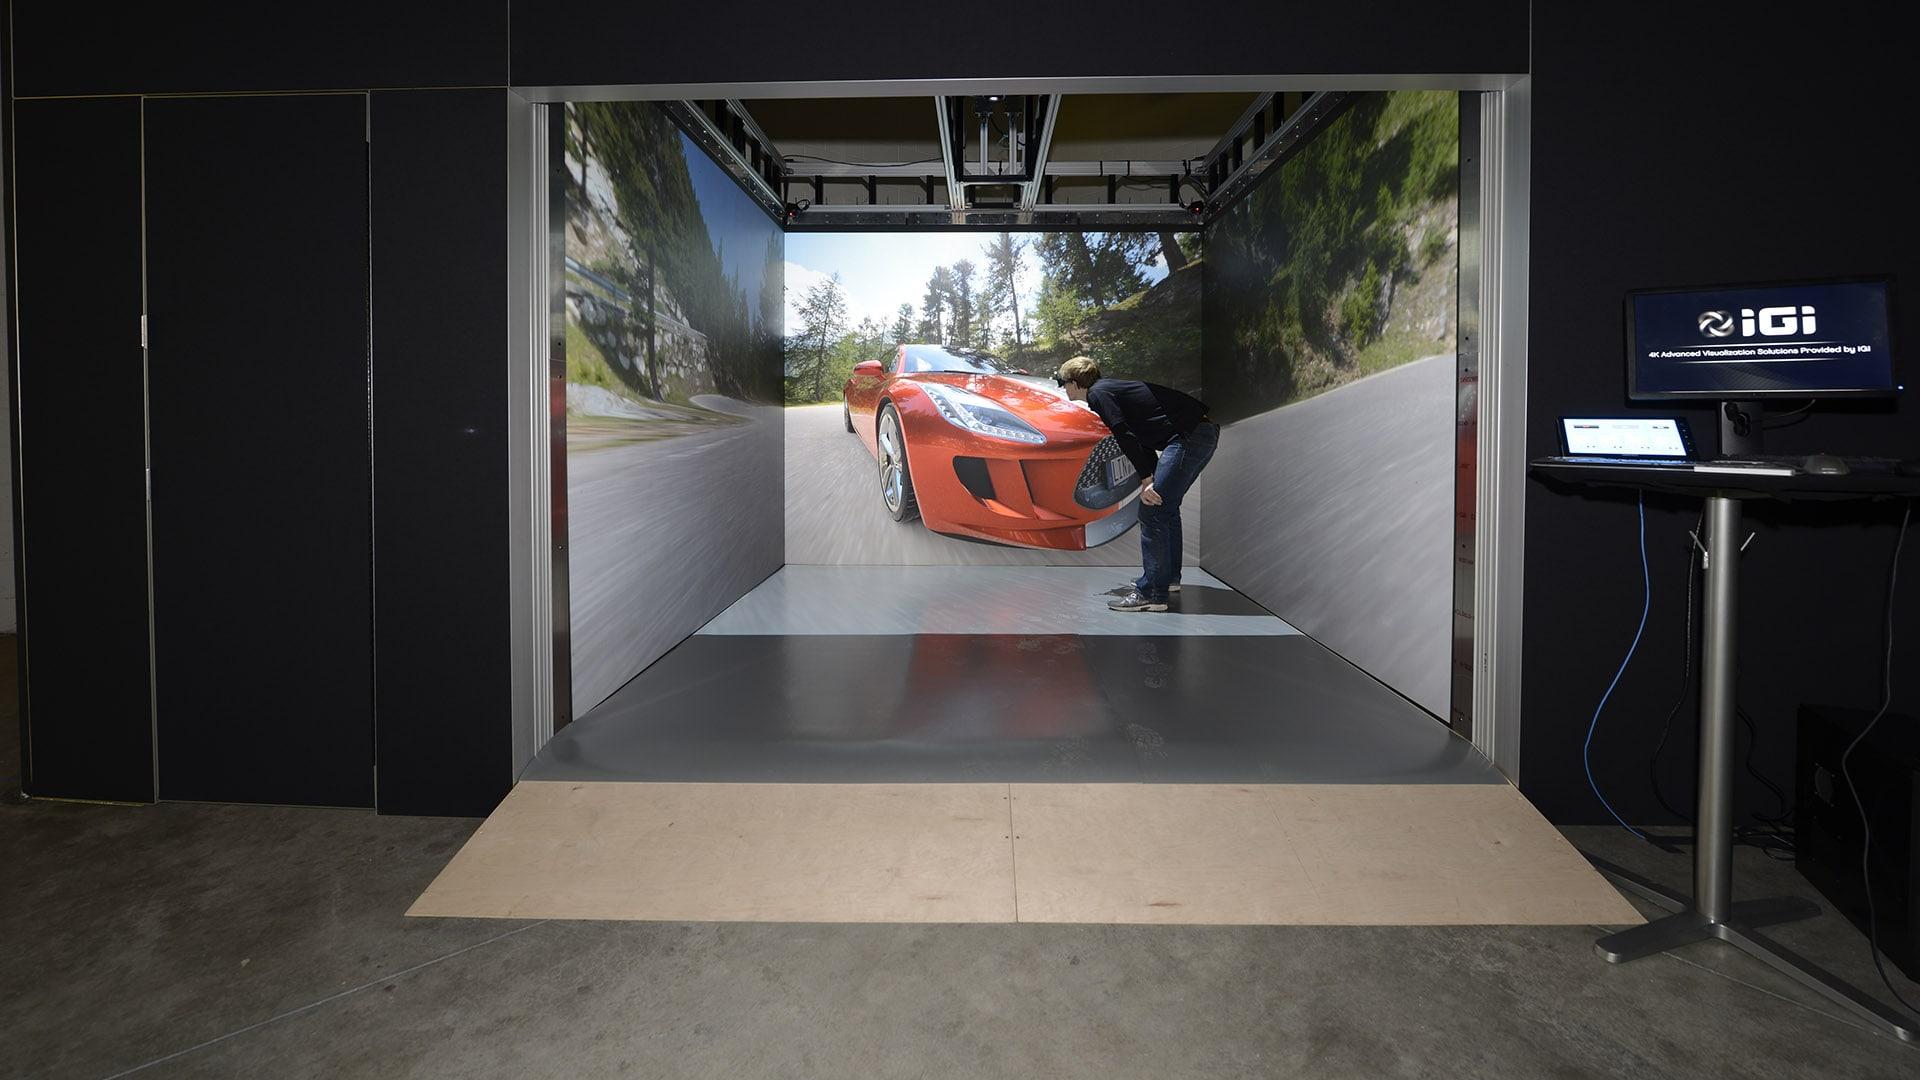 IGI HD CAVE automotive rendering 3D virtual reality